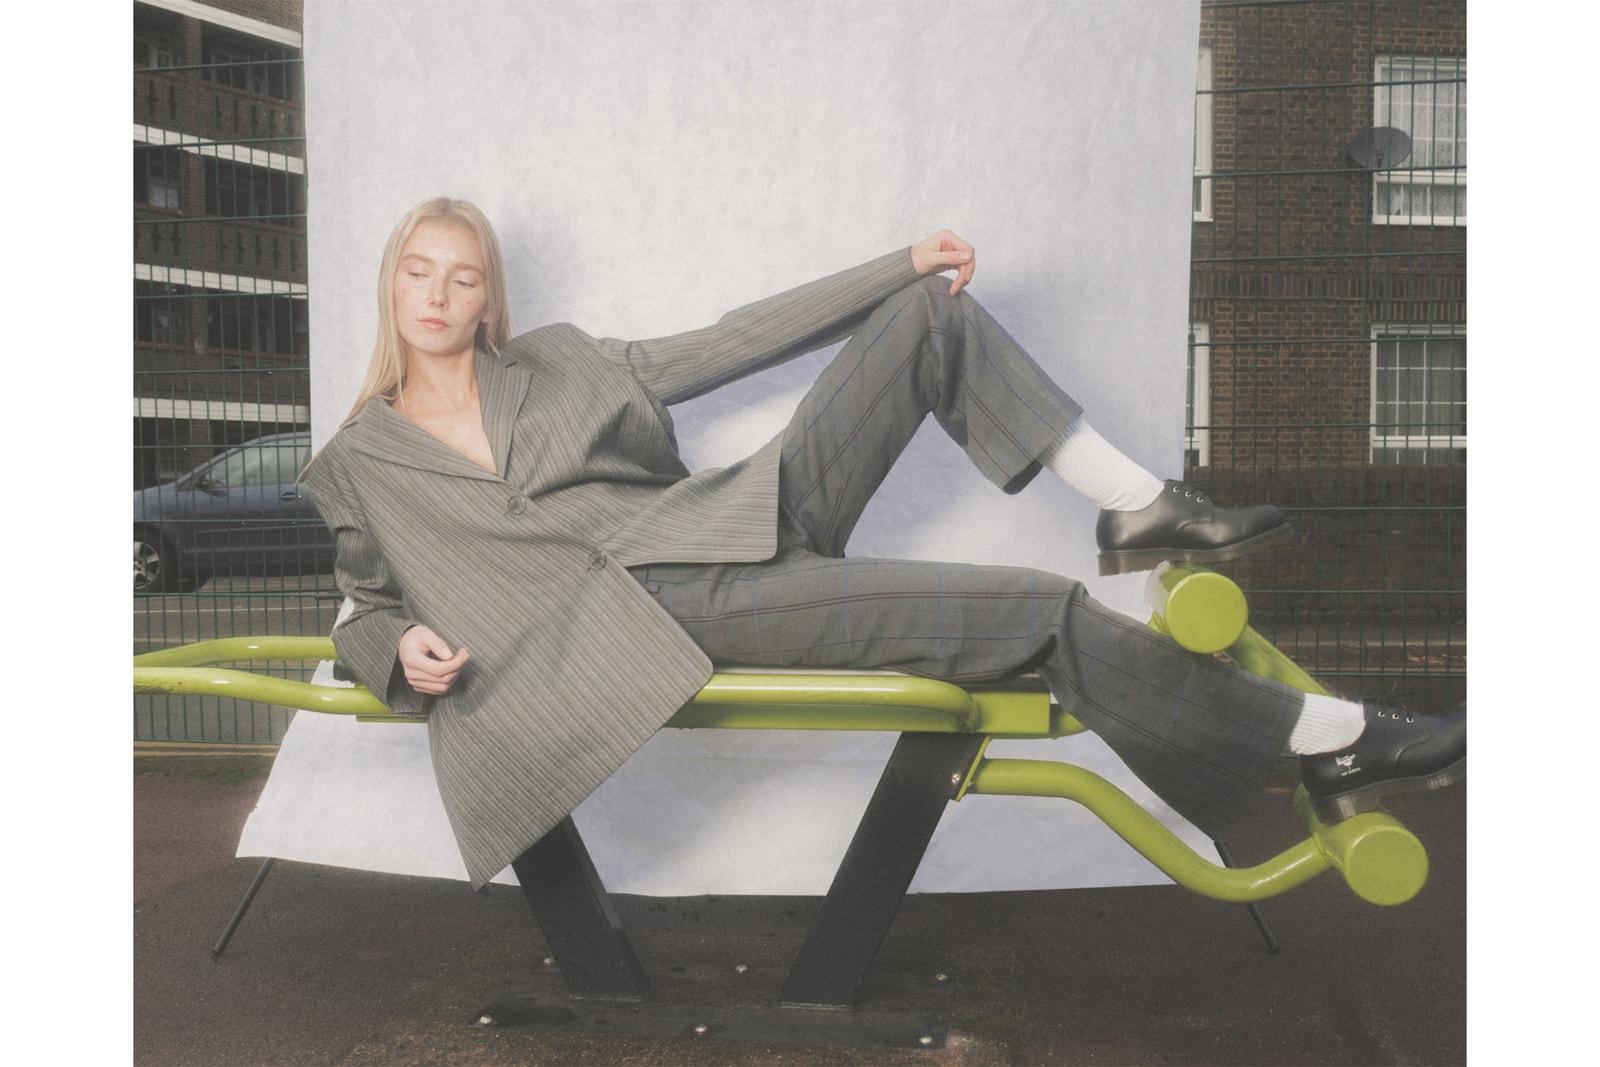 Modern Suits Women's Tailoring Fashion Trend Blazer Trousers Acne Studios DELADA Raf Simons Dr. Martens Noir Kei Ninomiya